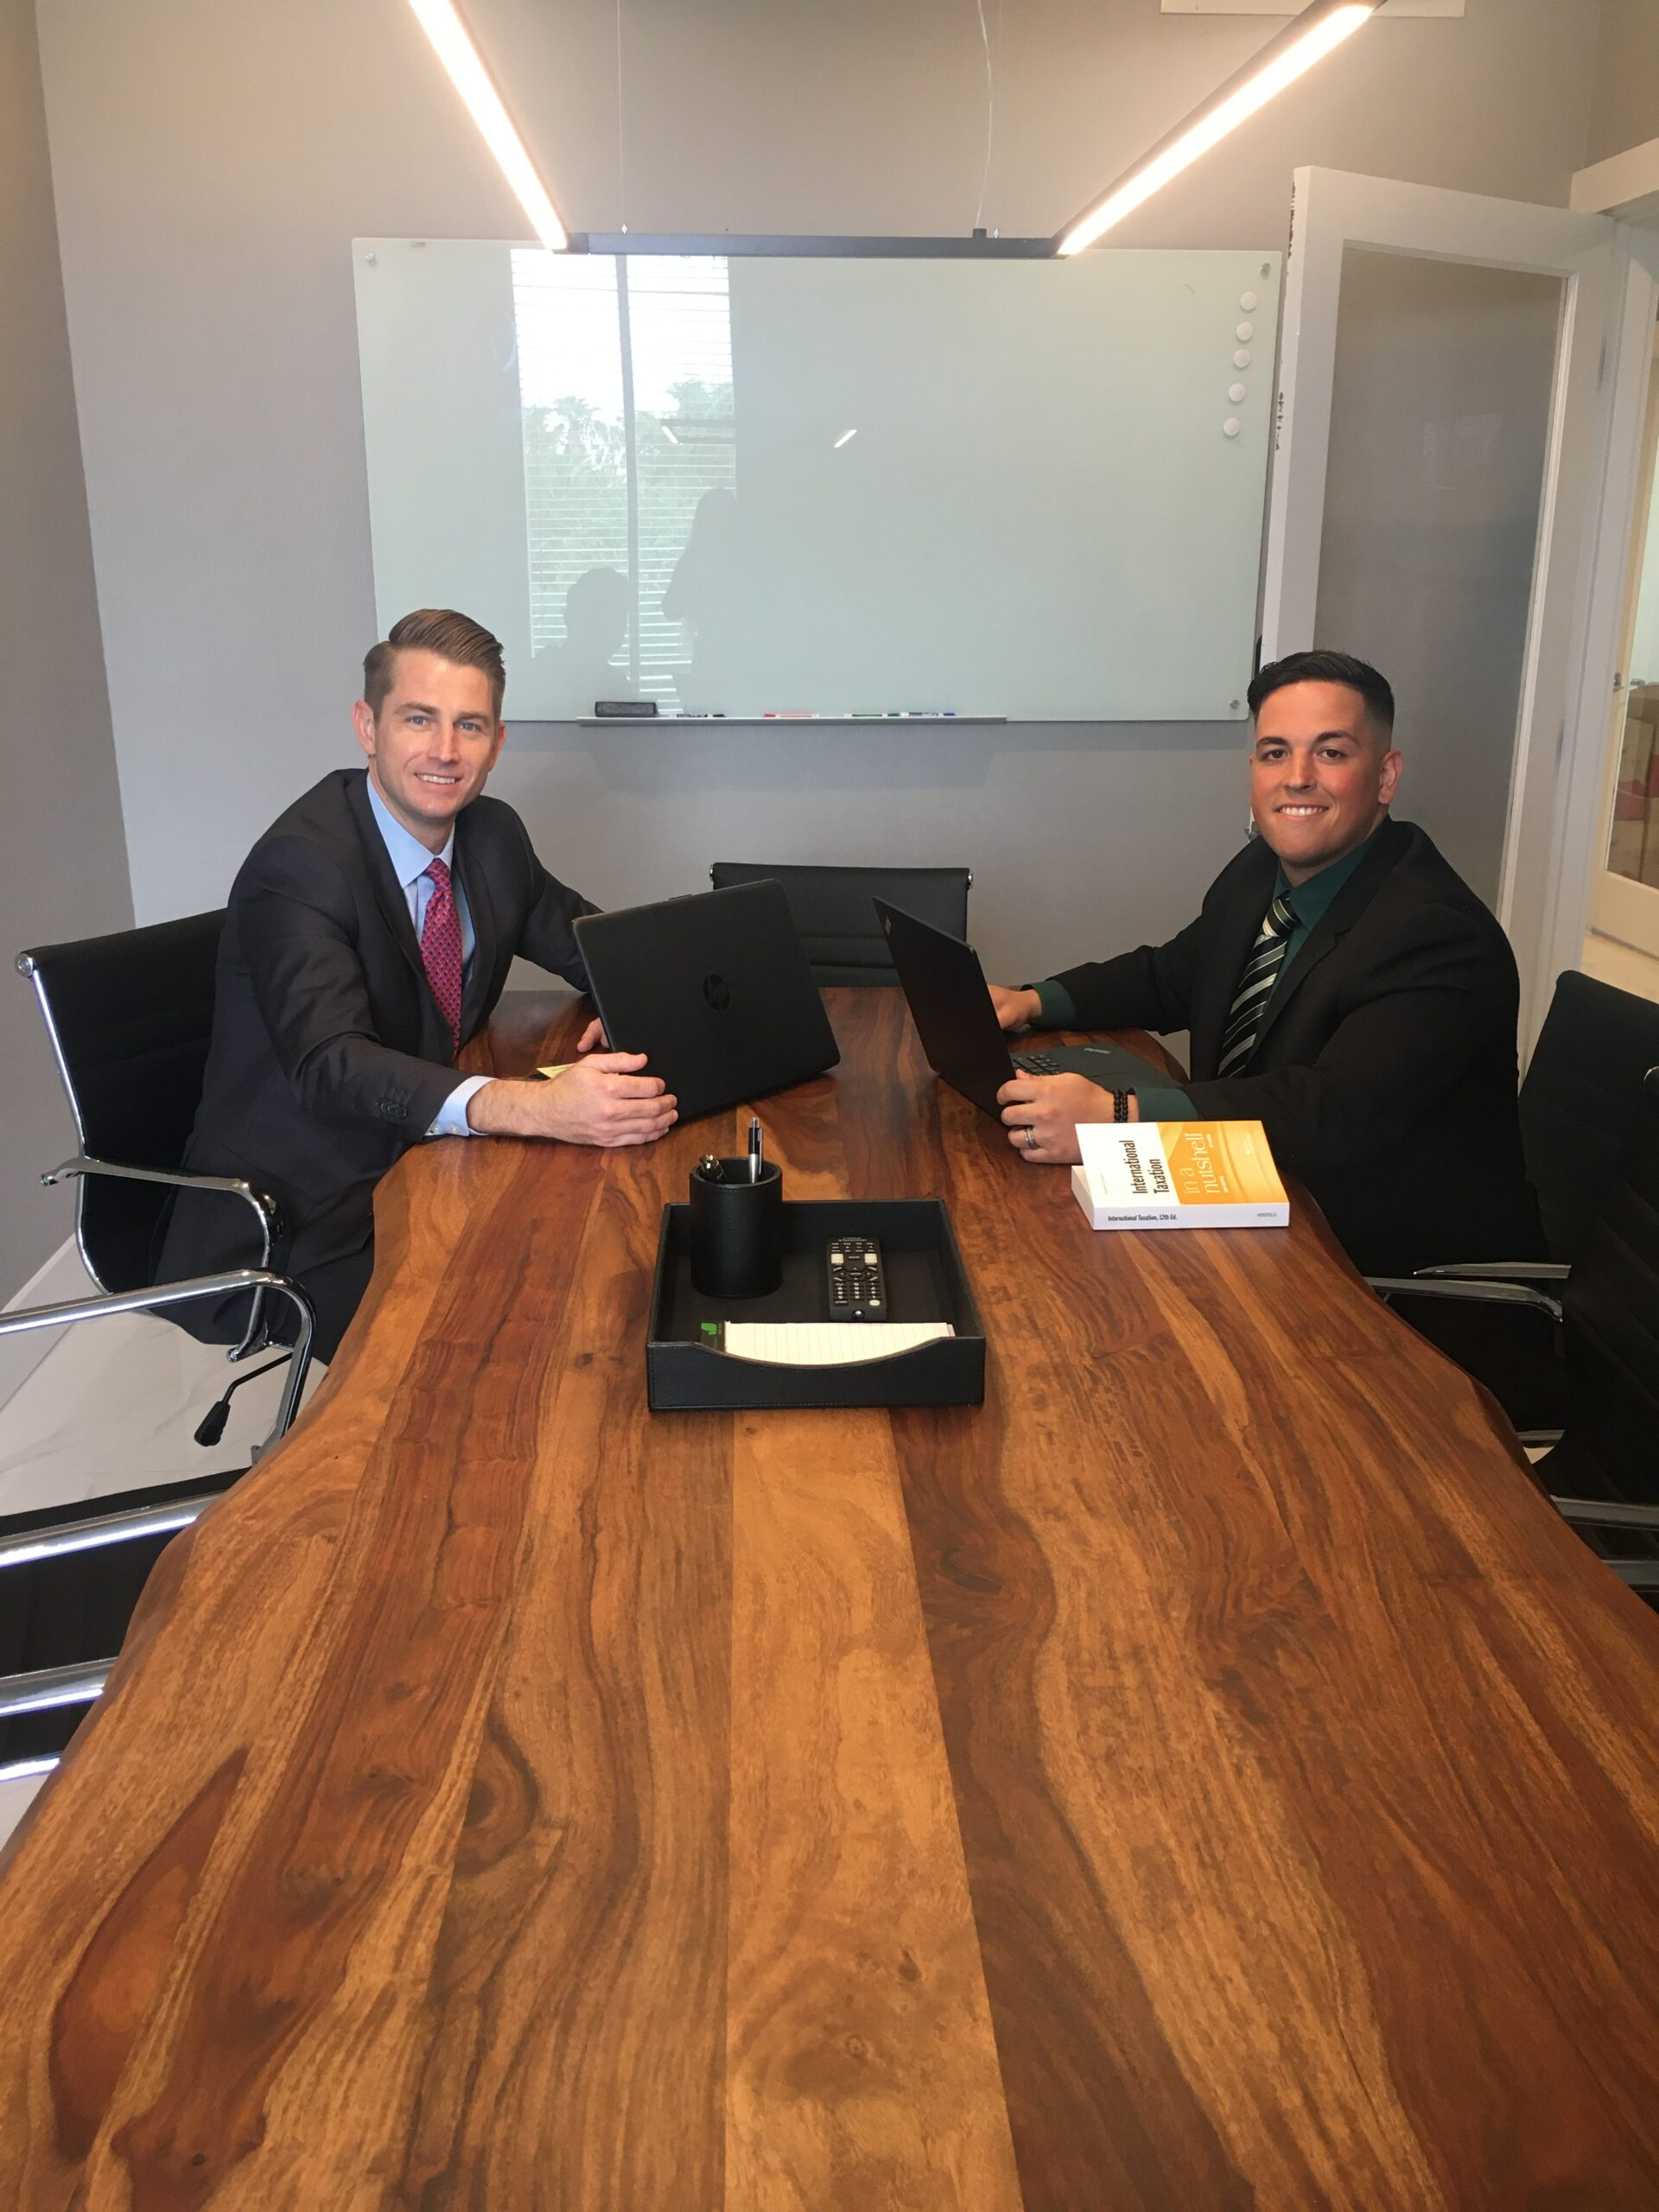 international tax advisors inc. miami ft. lauderdale doral international tax accountant drew r edwards CPA 2020 intern